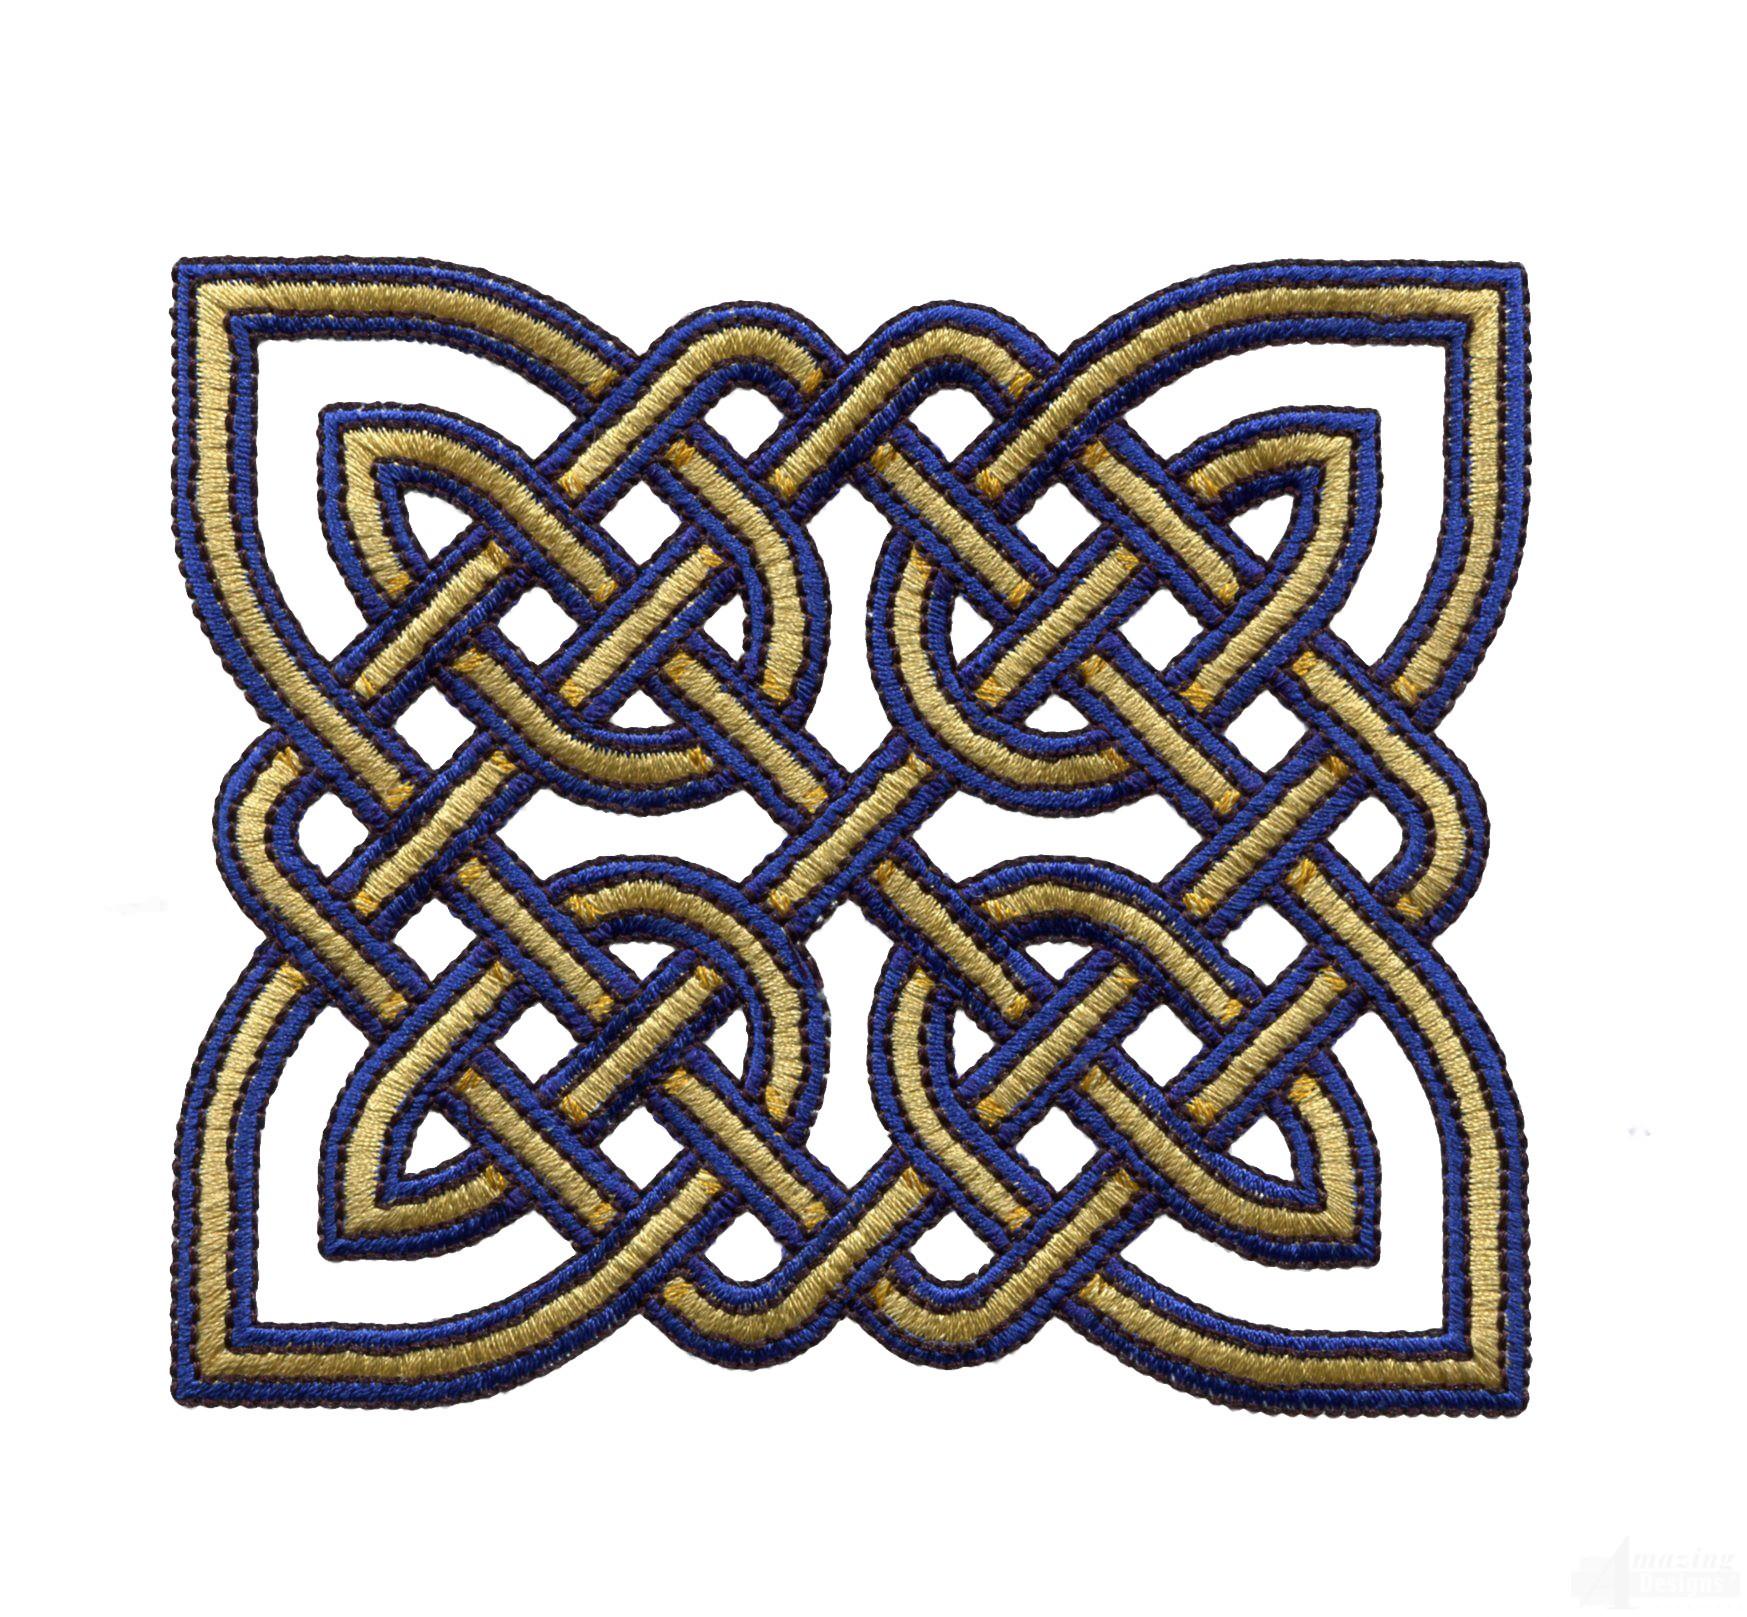 Rectangular Celtic Knot Embroidery Design